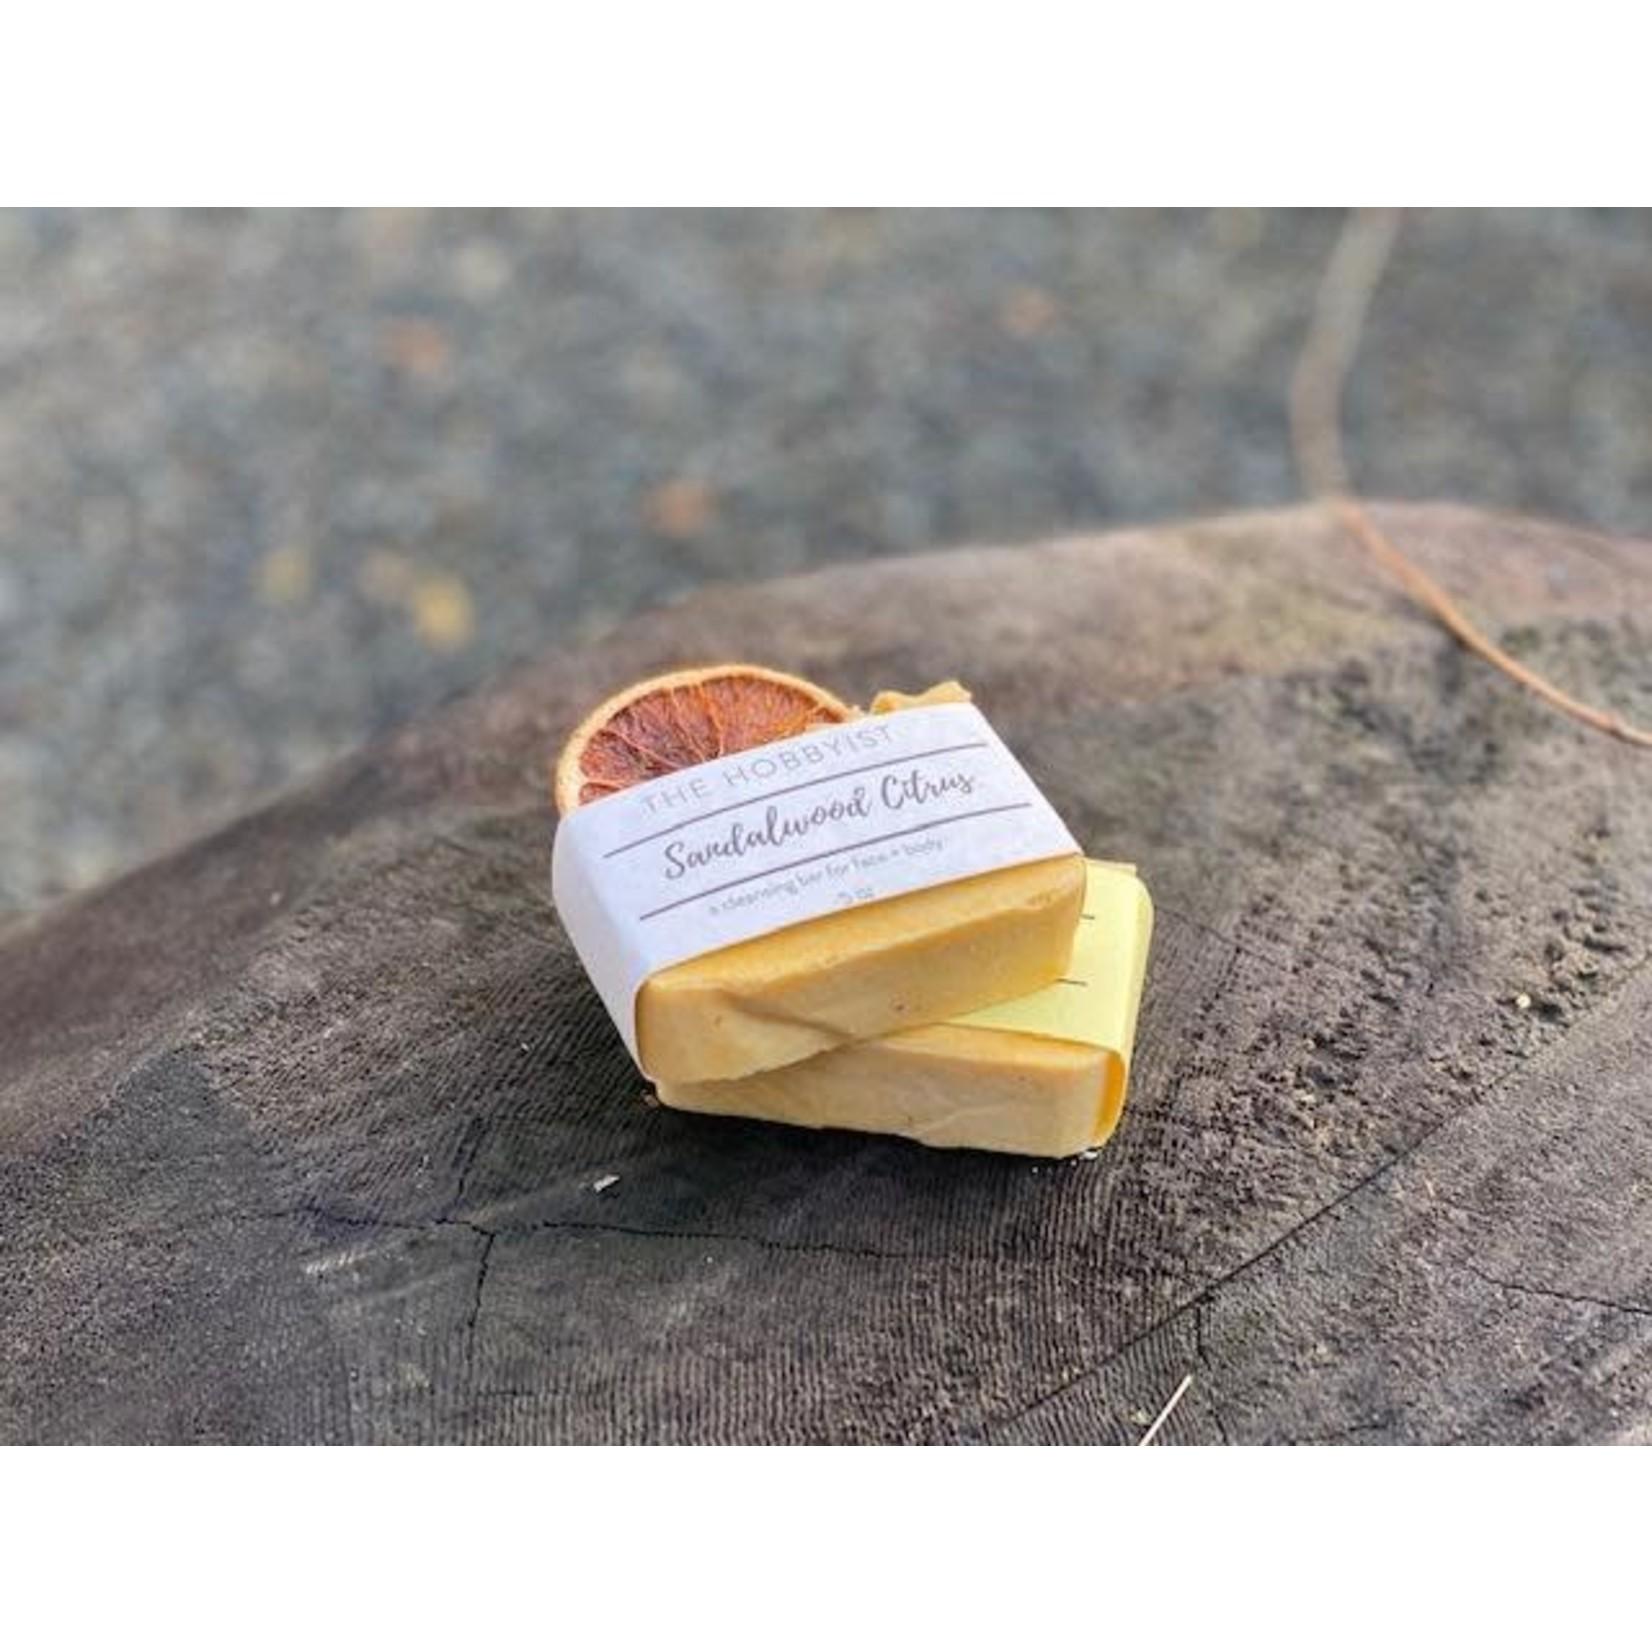 The Hobbyist Sandalwood + Citrus Cold Press Soap